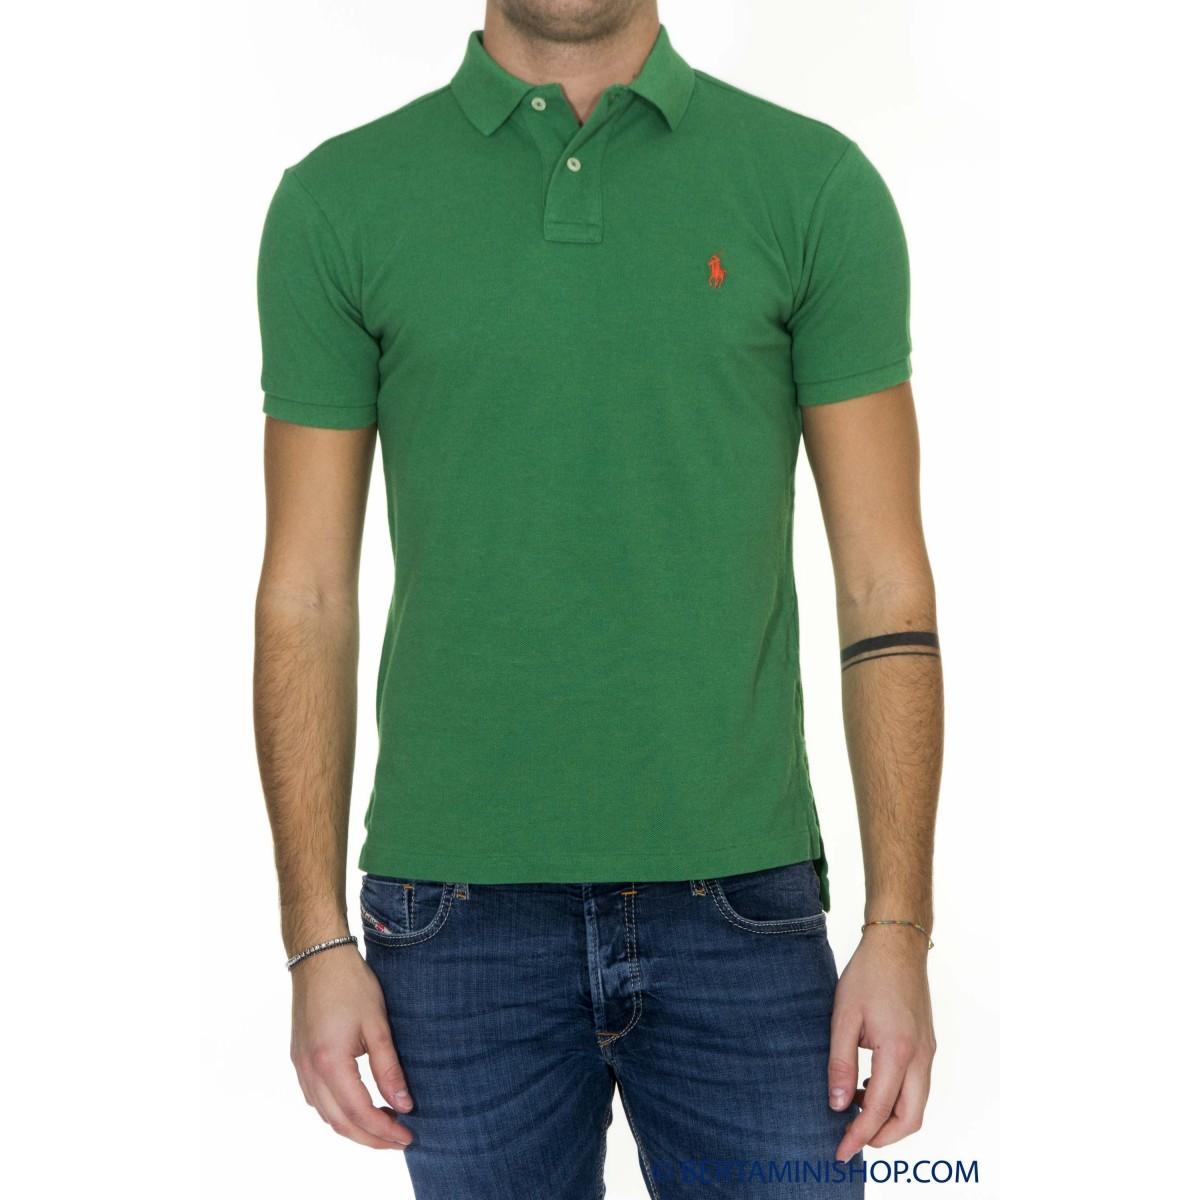 Polo Ralph Lauren Man - A12Ks01Cc0004 A33NG - Verde melange